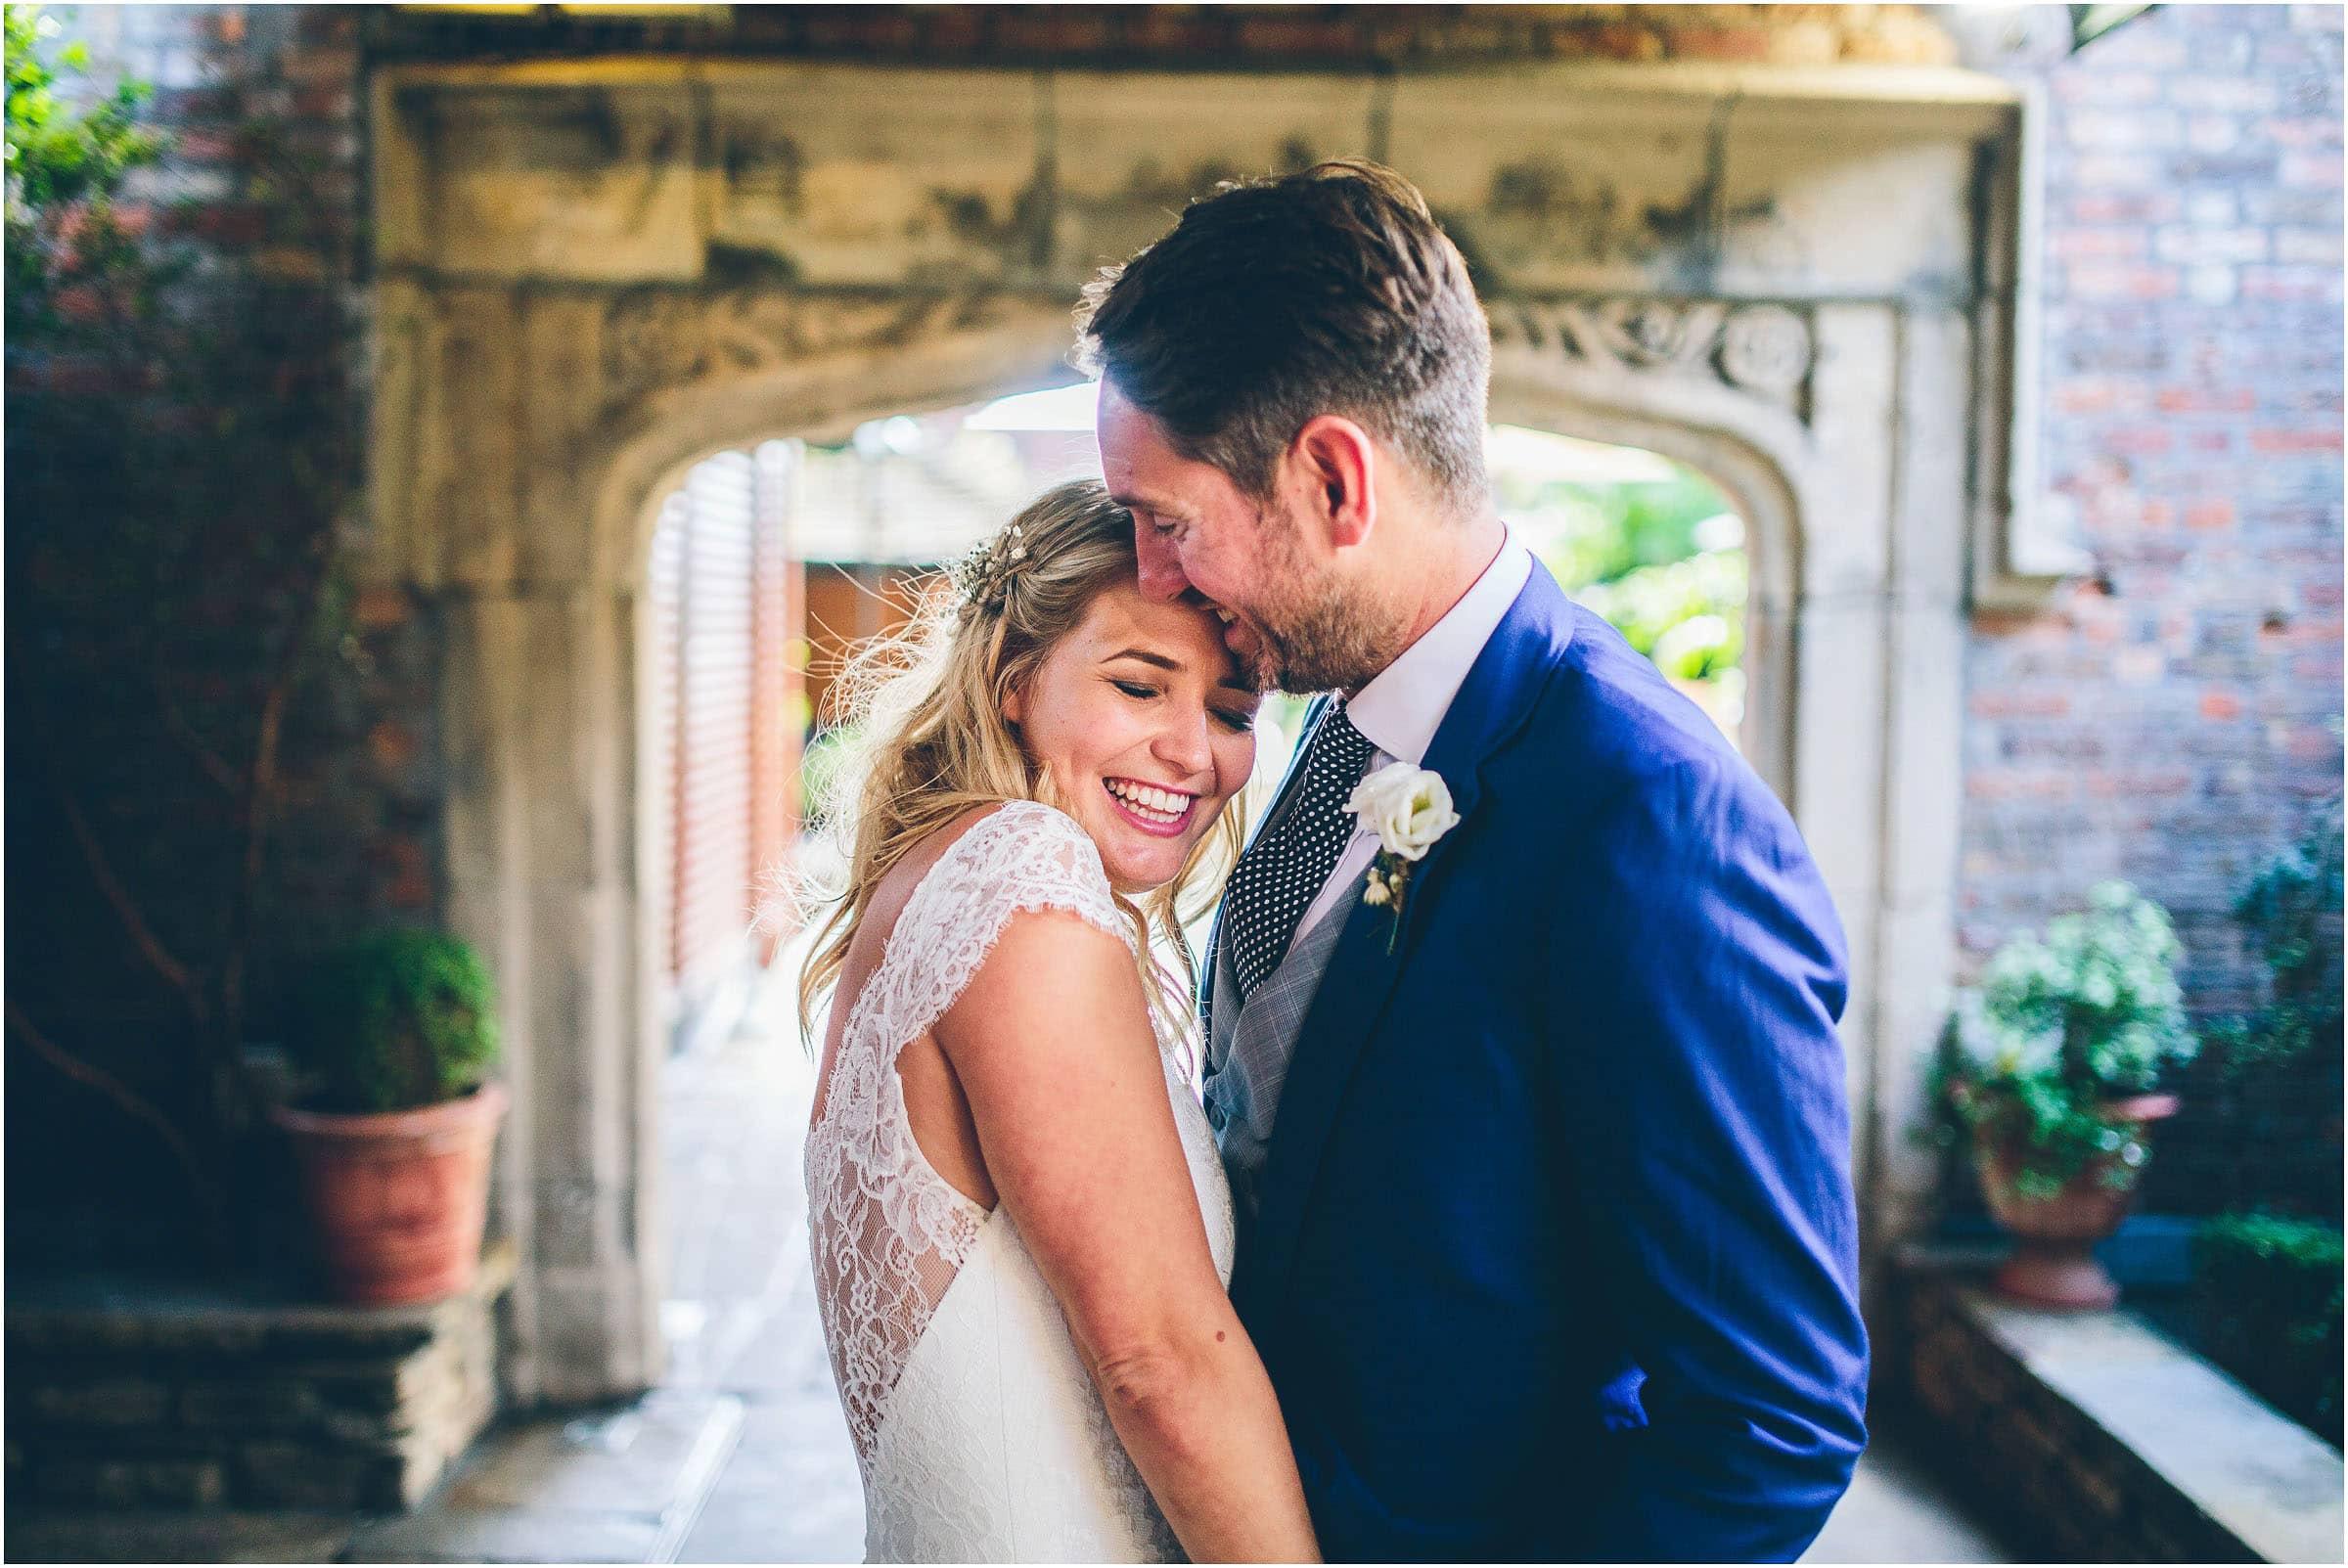 Kensington_Roof_Gardens_Wedding_Photography_0062